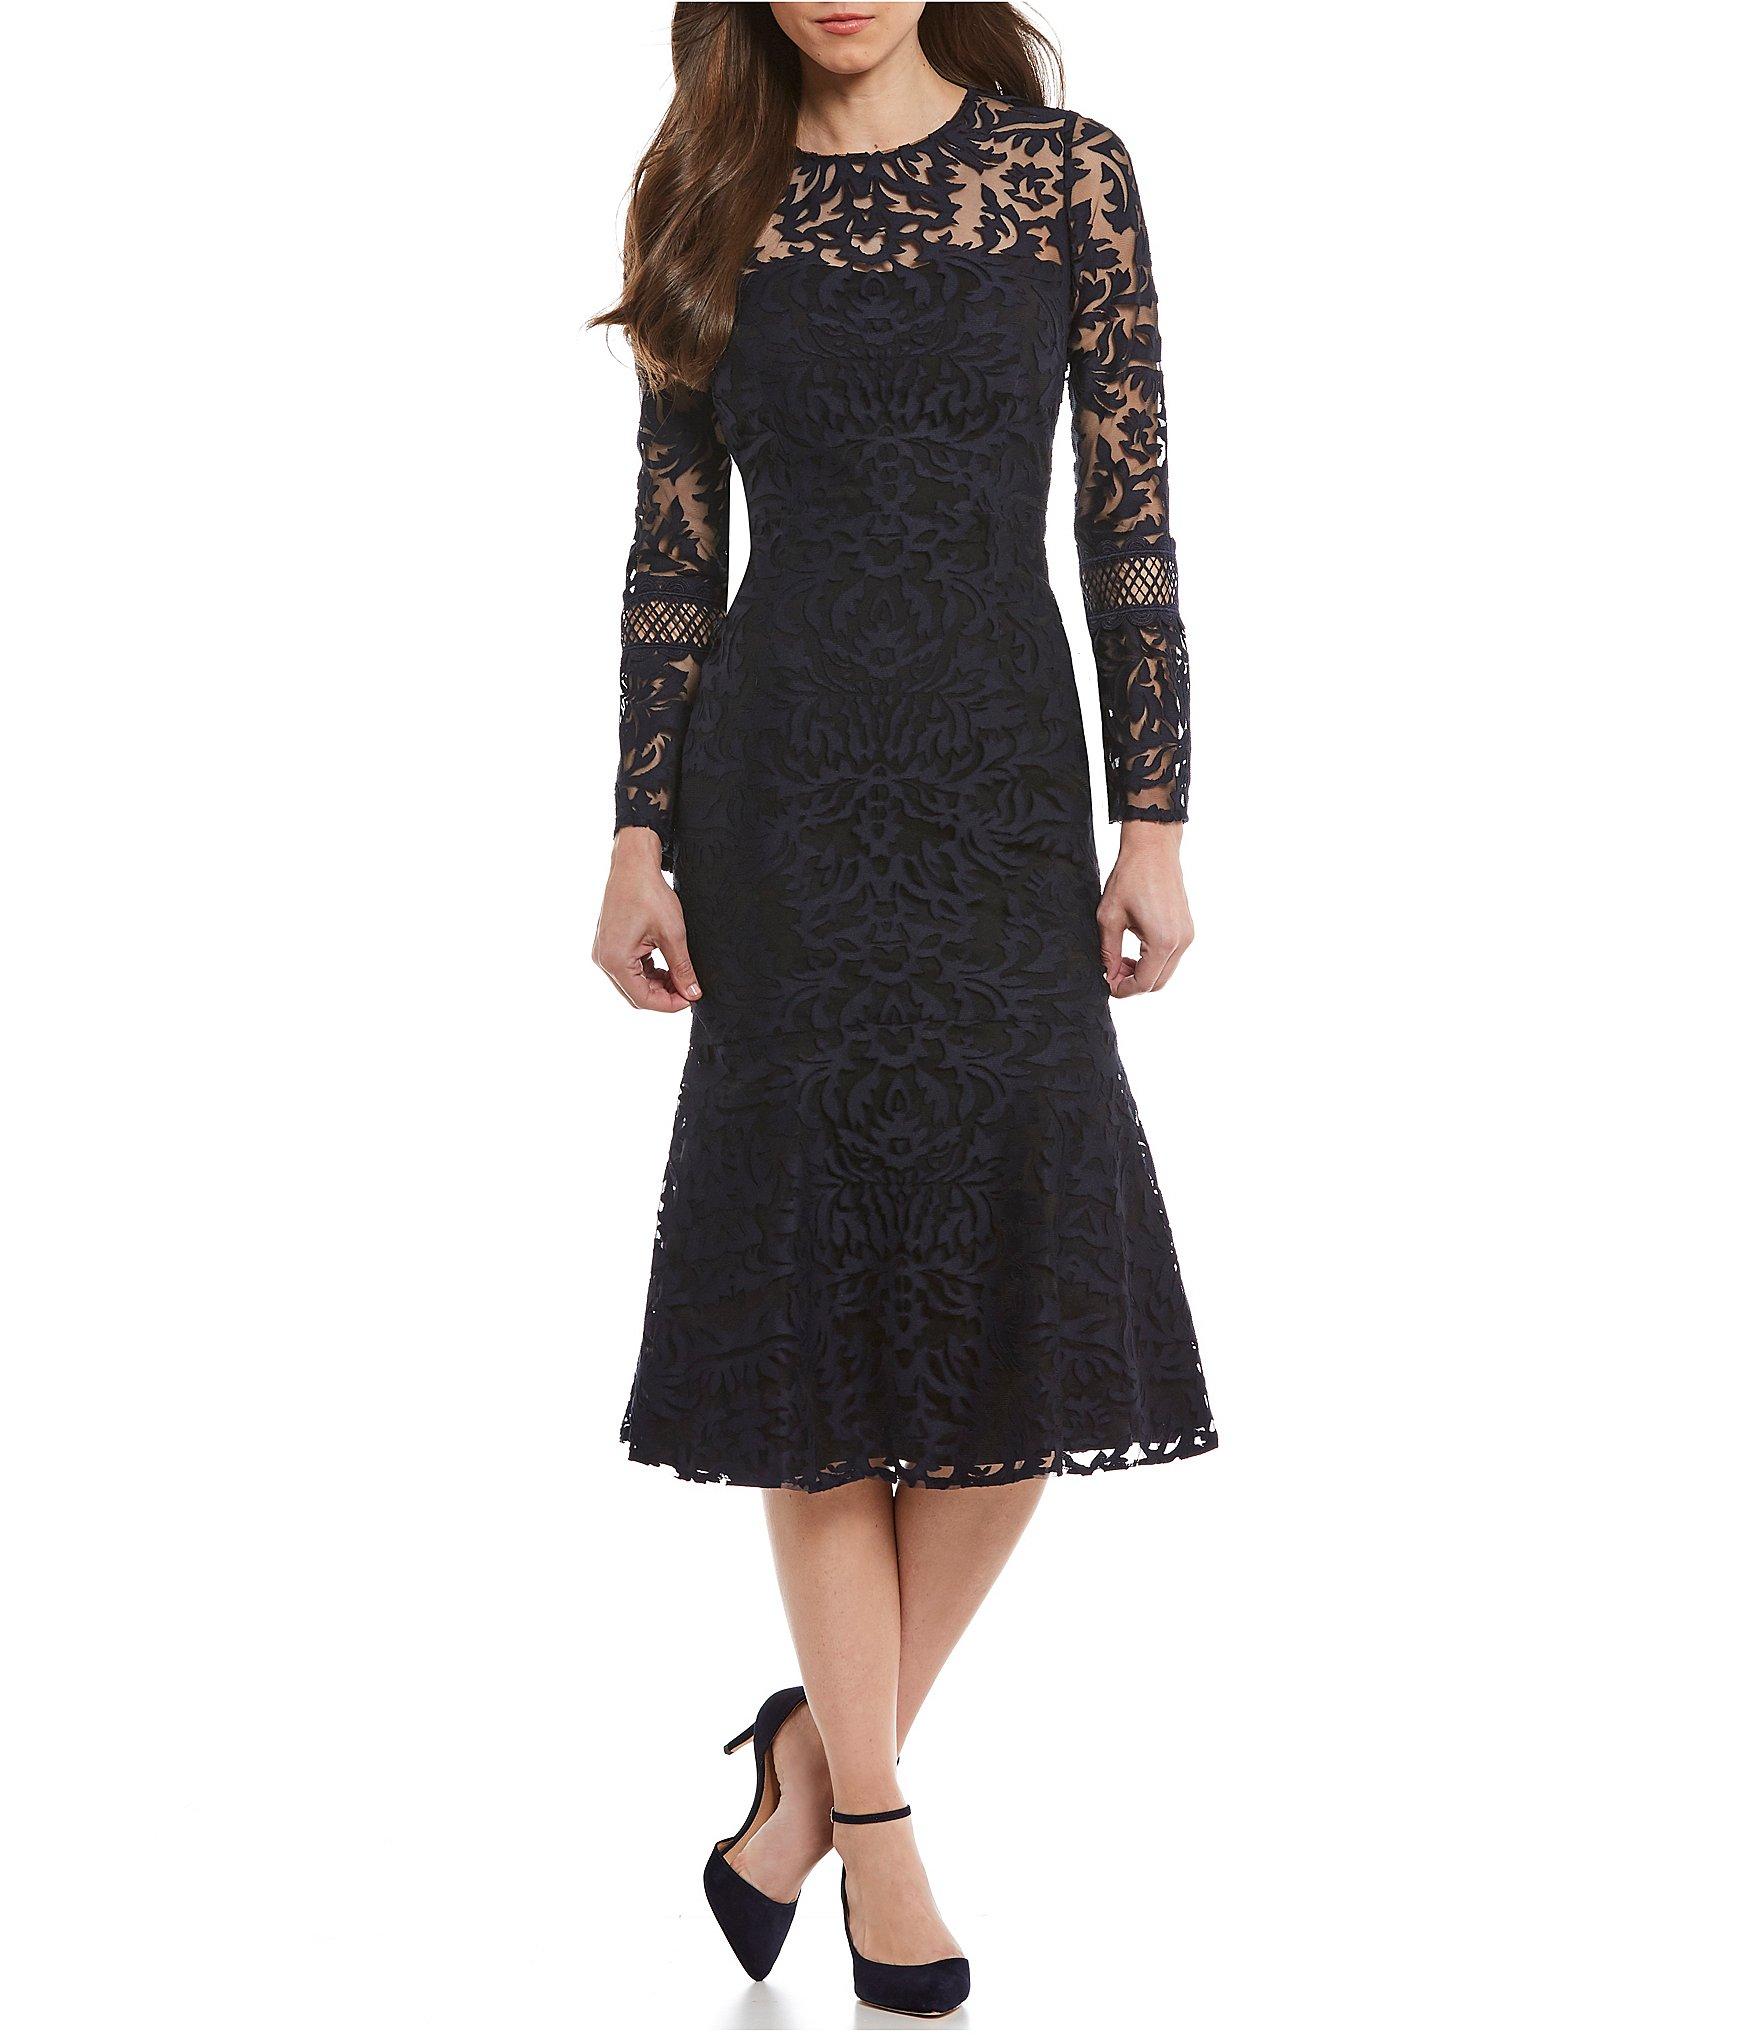 Antonio Melani Alfa Lace Bell-Sleeve Black Dress NWT Size 0, 2 See more like this Antonio Melani American Beauty Natalie Dress New With Tags $ Size 2 Brand New · Antonio Melani · Size (Women's)